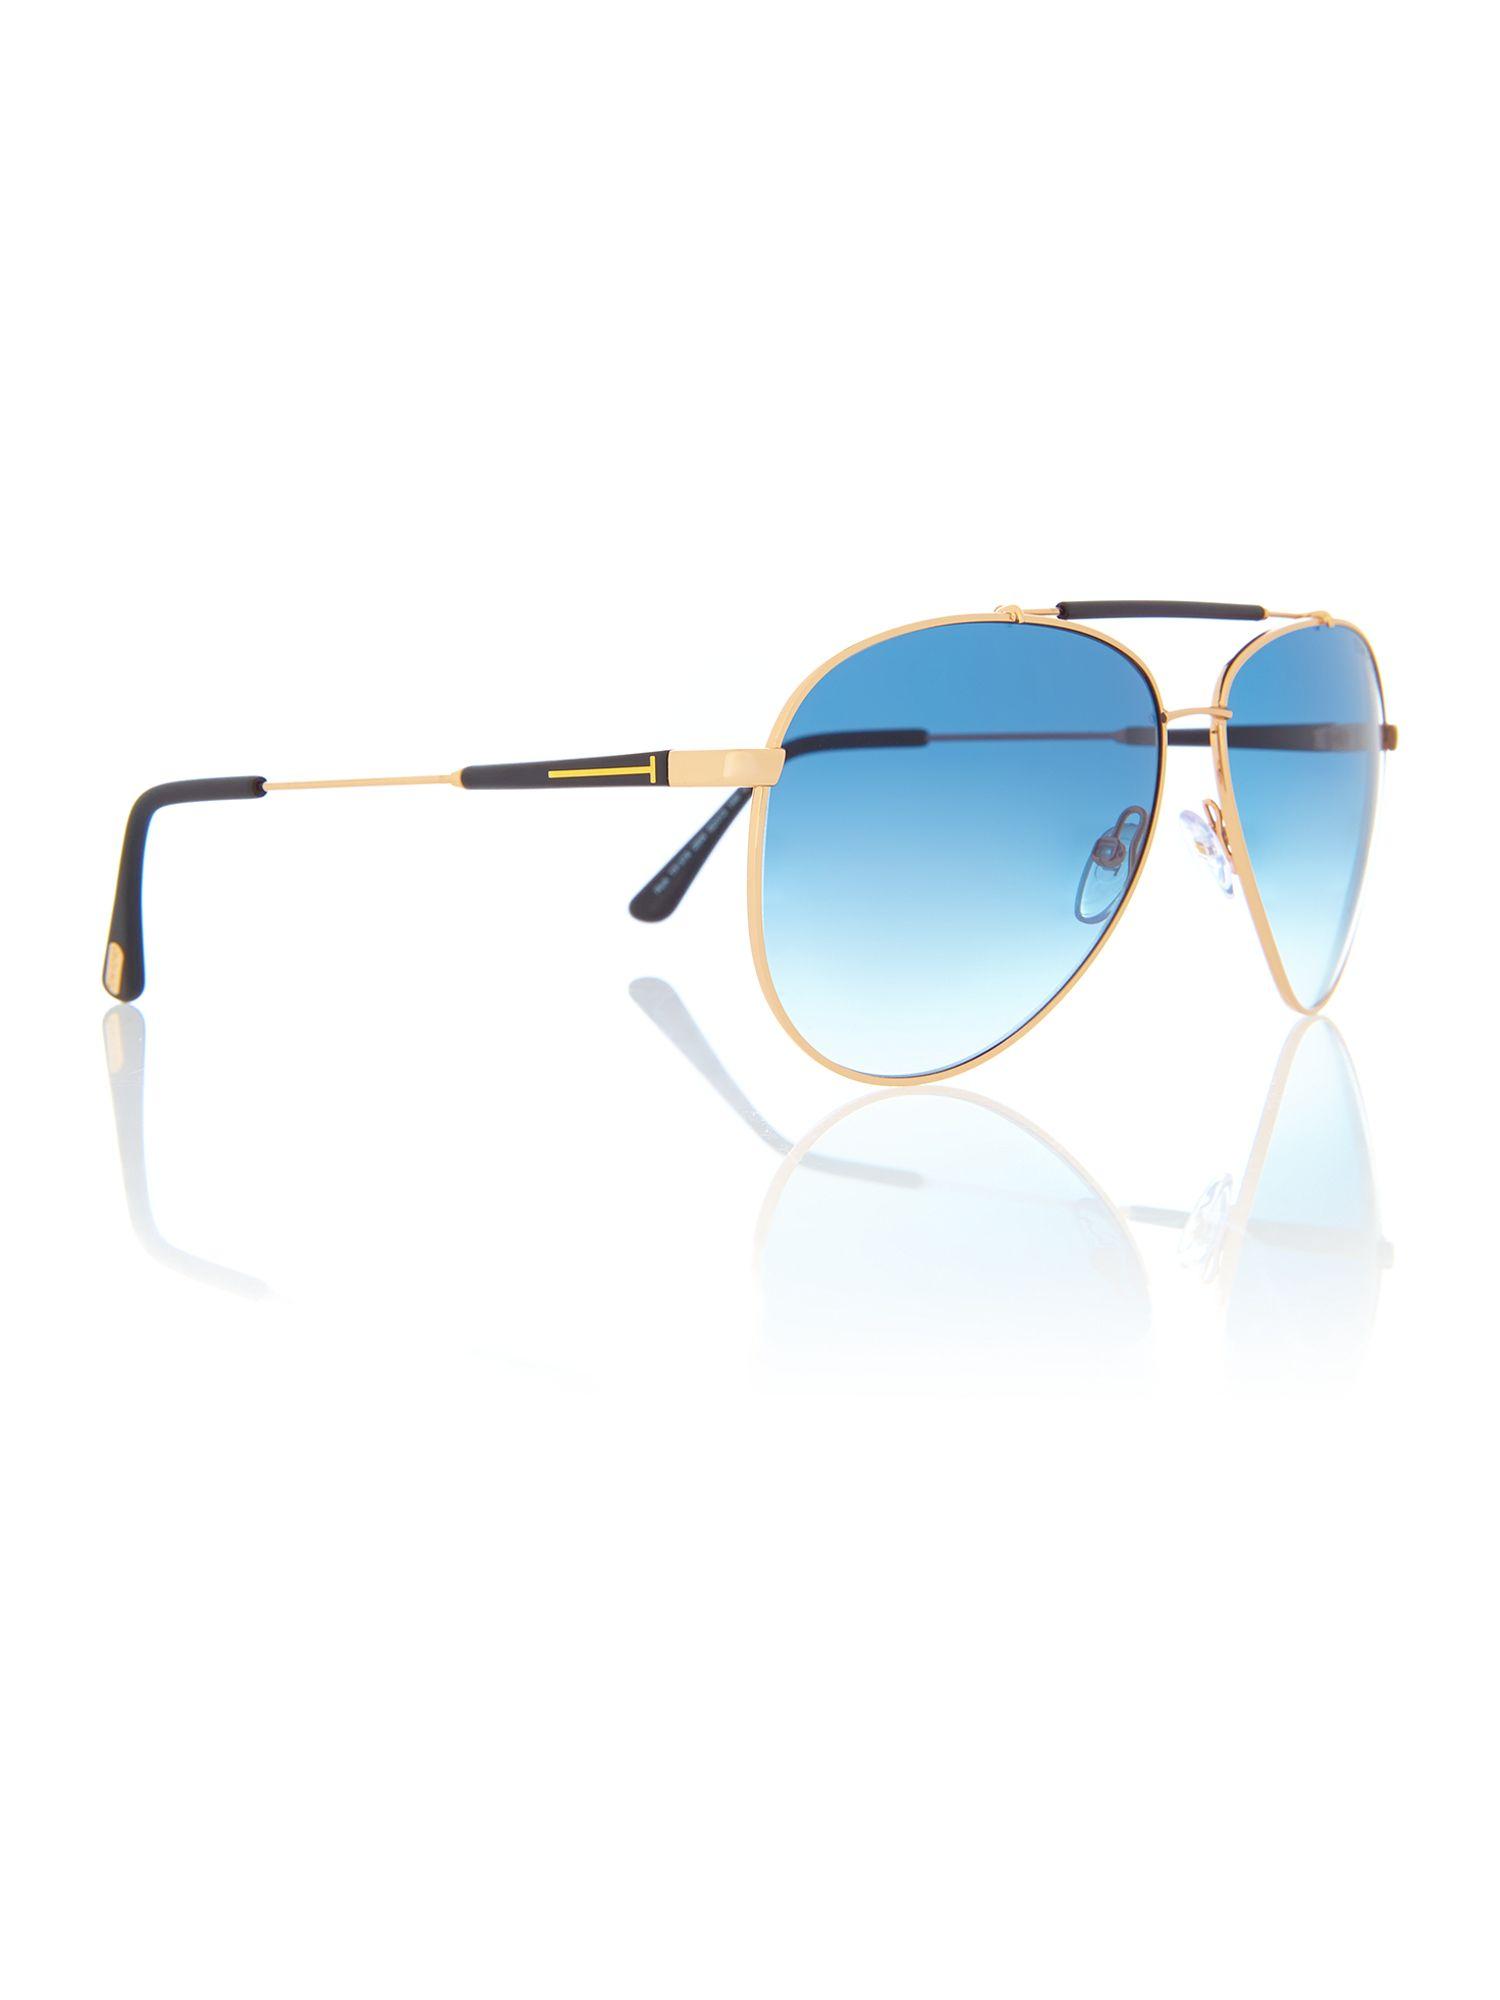 Tom Ford 0Tr000571 Rectangle Sunglasses in Blue for Men